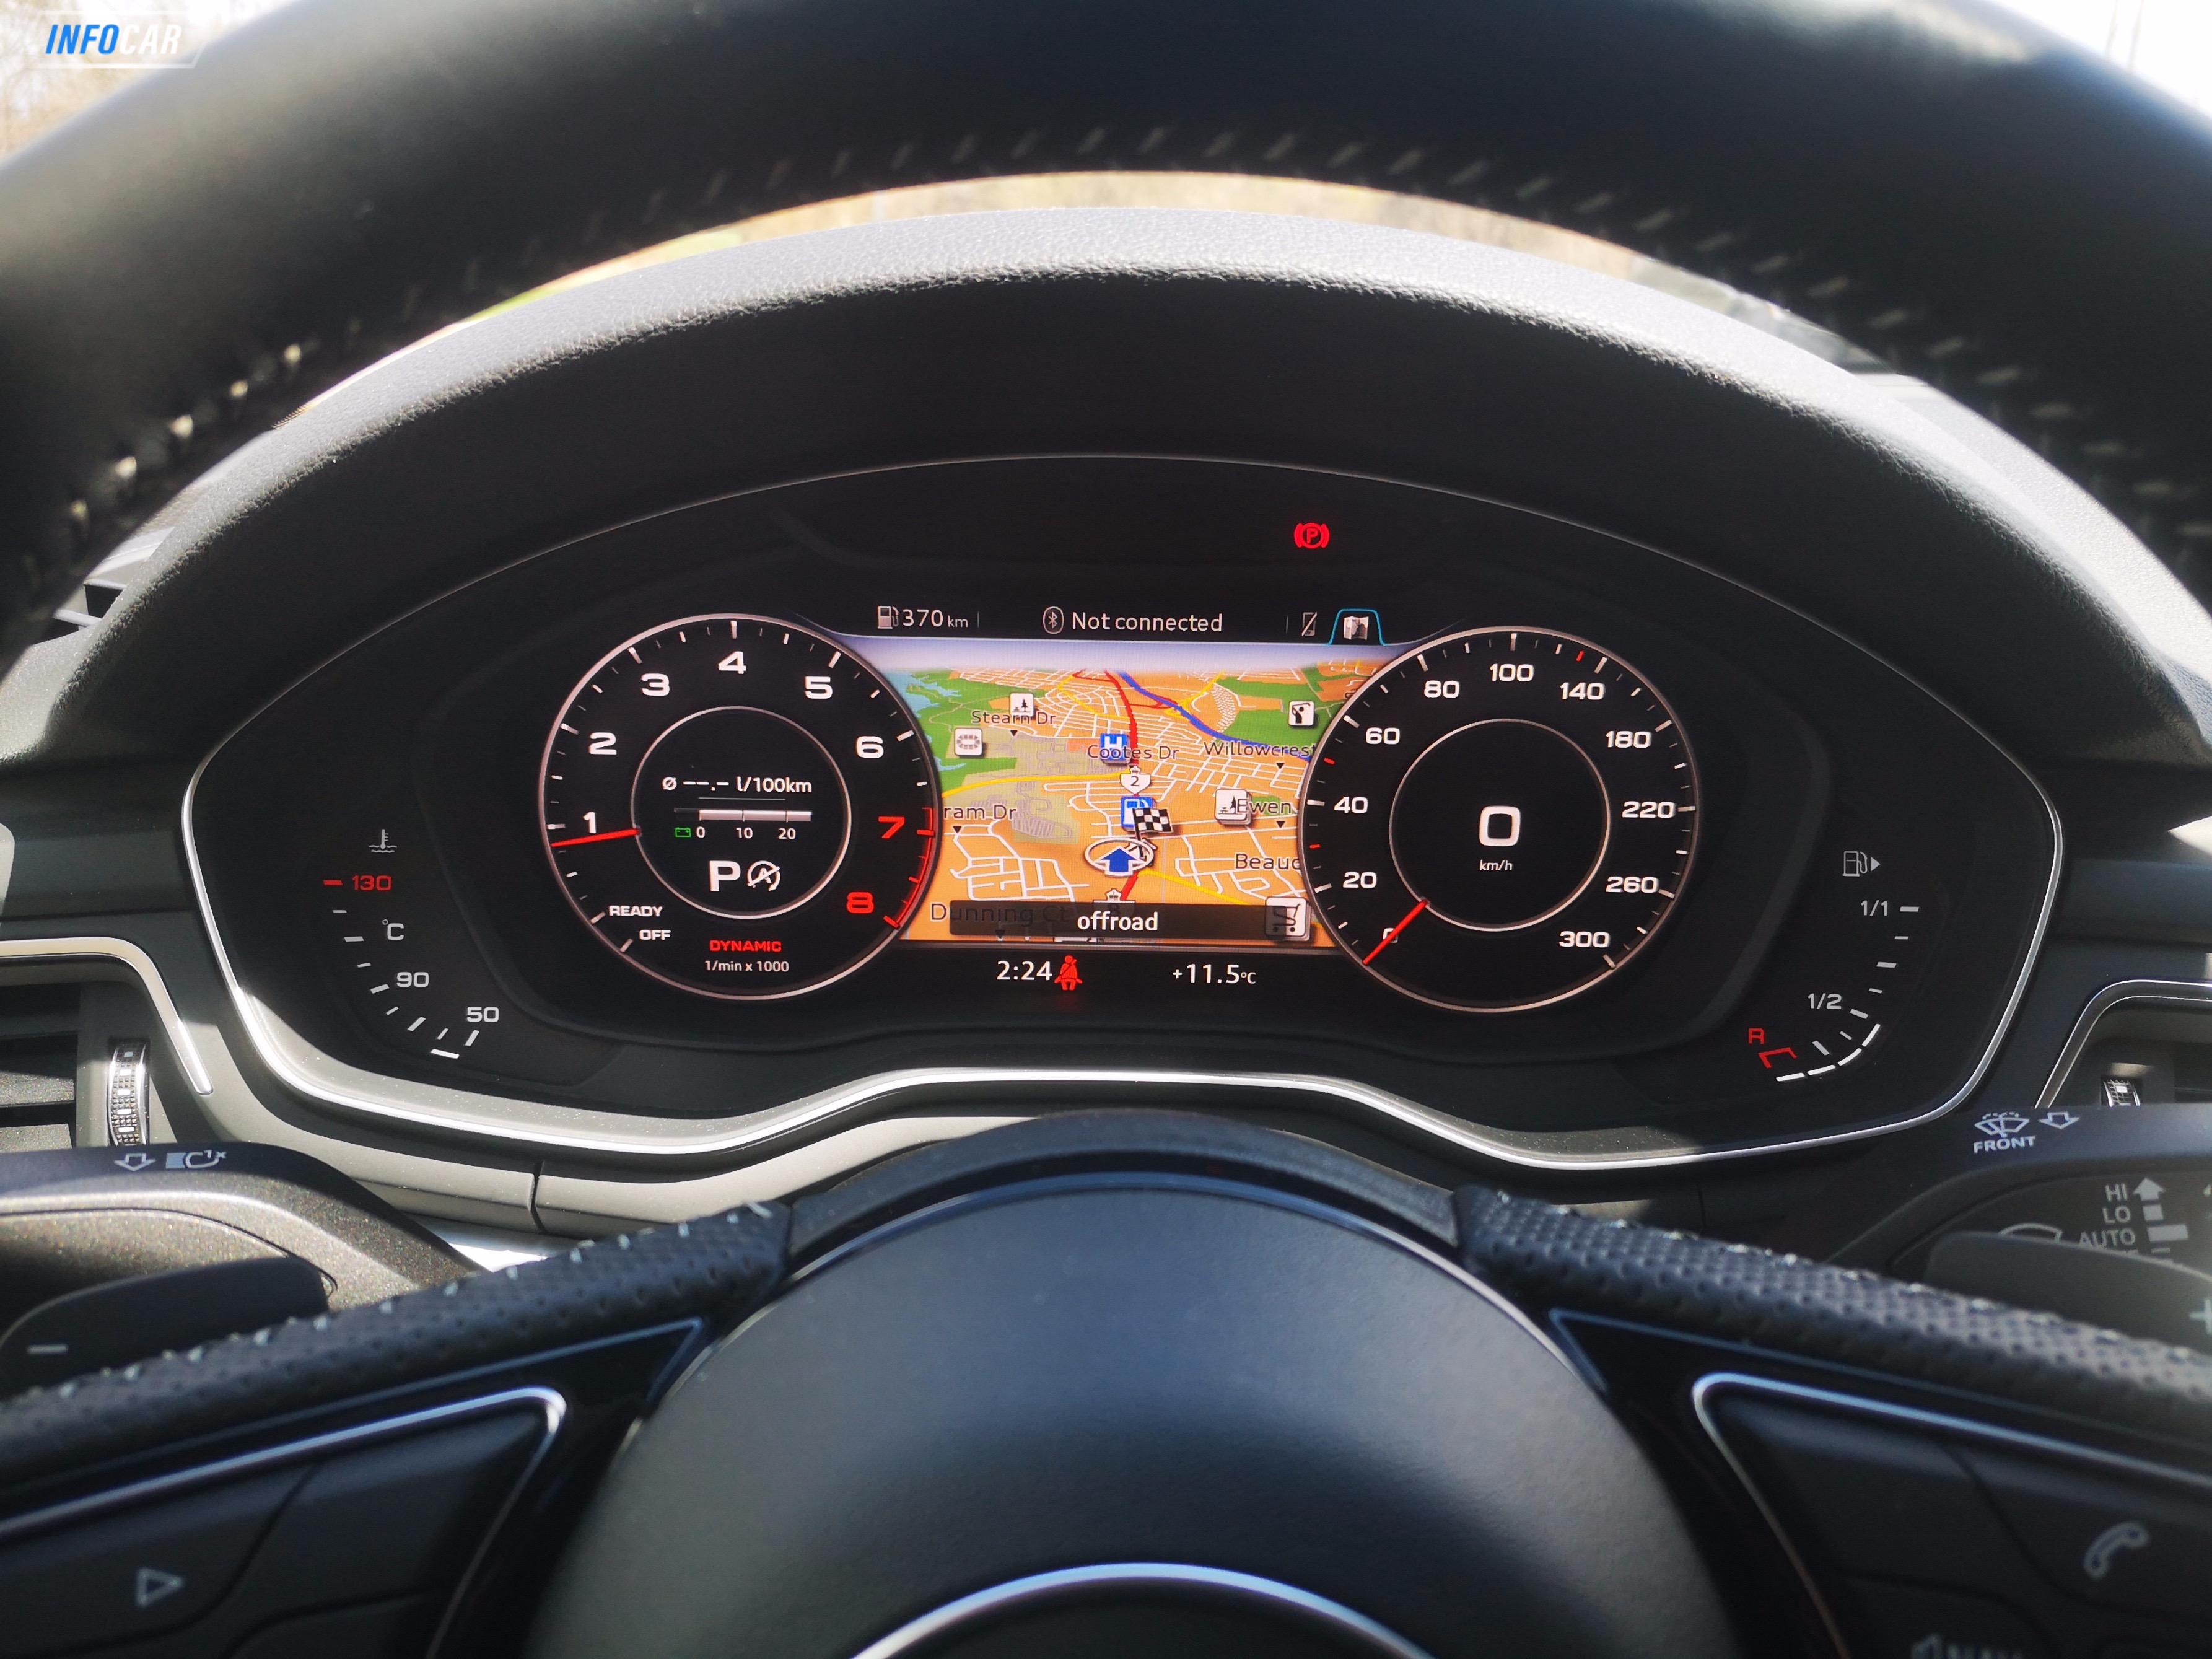 2018 Audi A5 Sportback Tecknik 45 Quattro - INFOCAR - Toronto's Most Comprehensive New and Used Auto Trading Platform